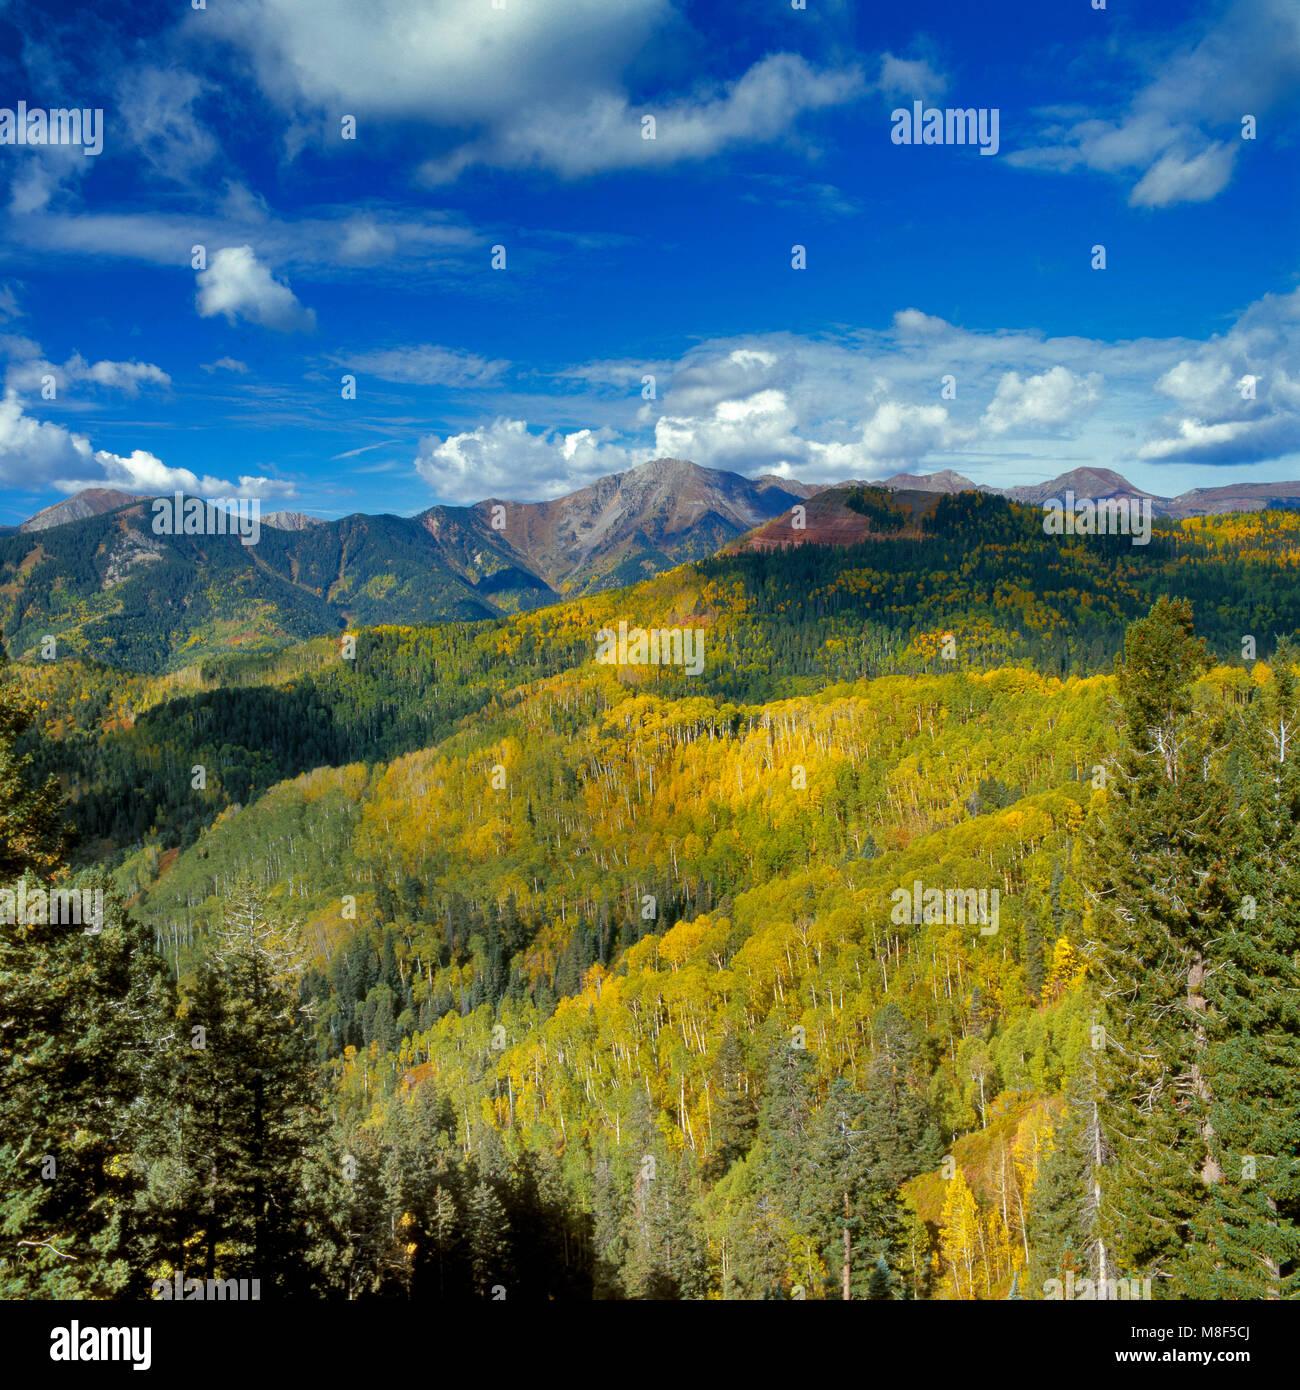 Aspen, Populus tremuloides, Silver Mountain, San Juan National Forest, Colorado - Stock Image